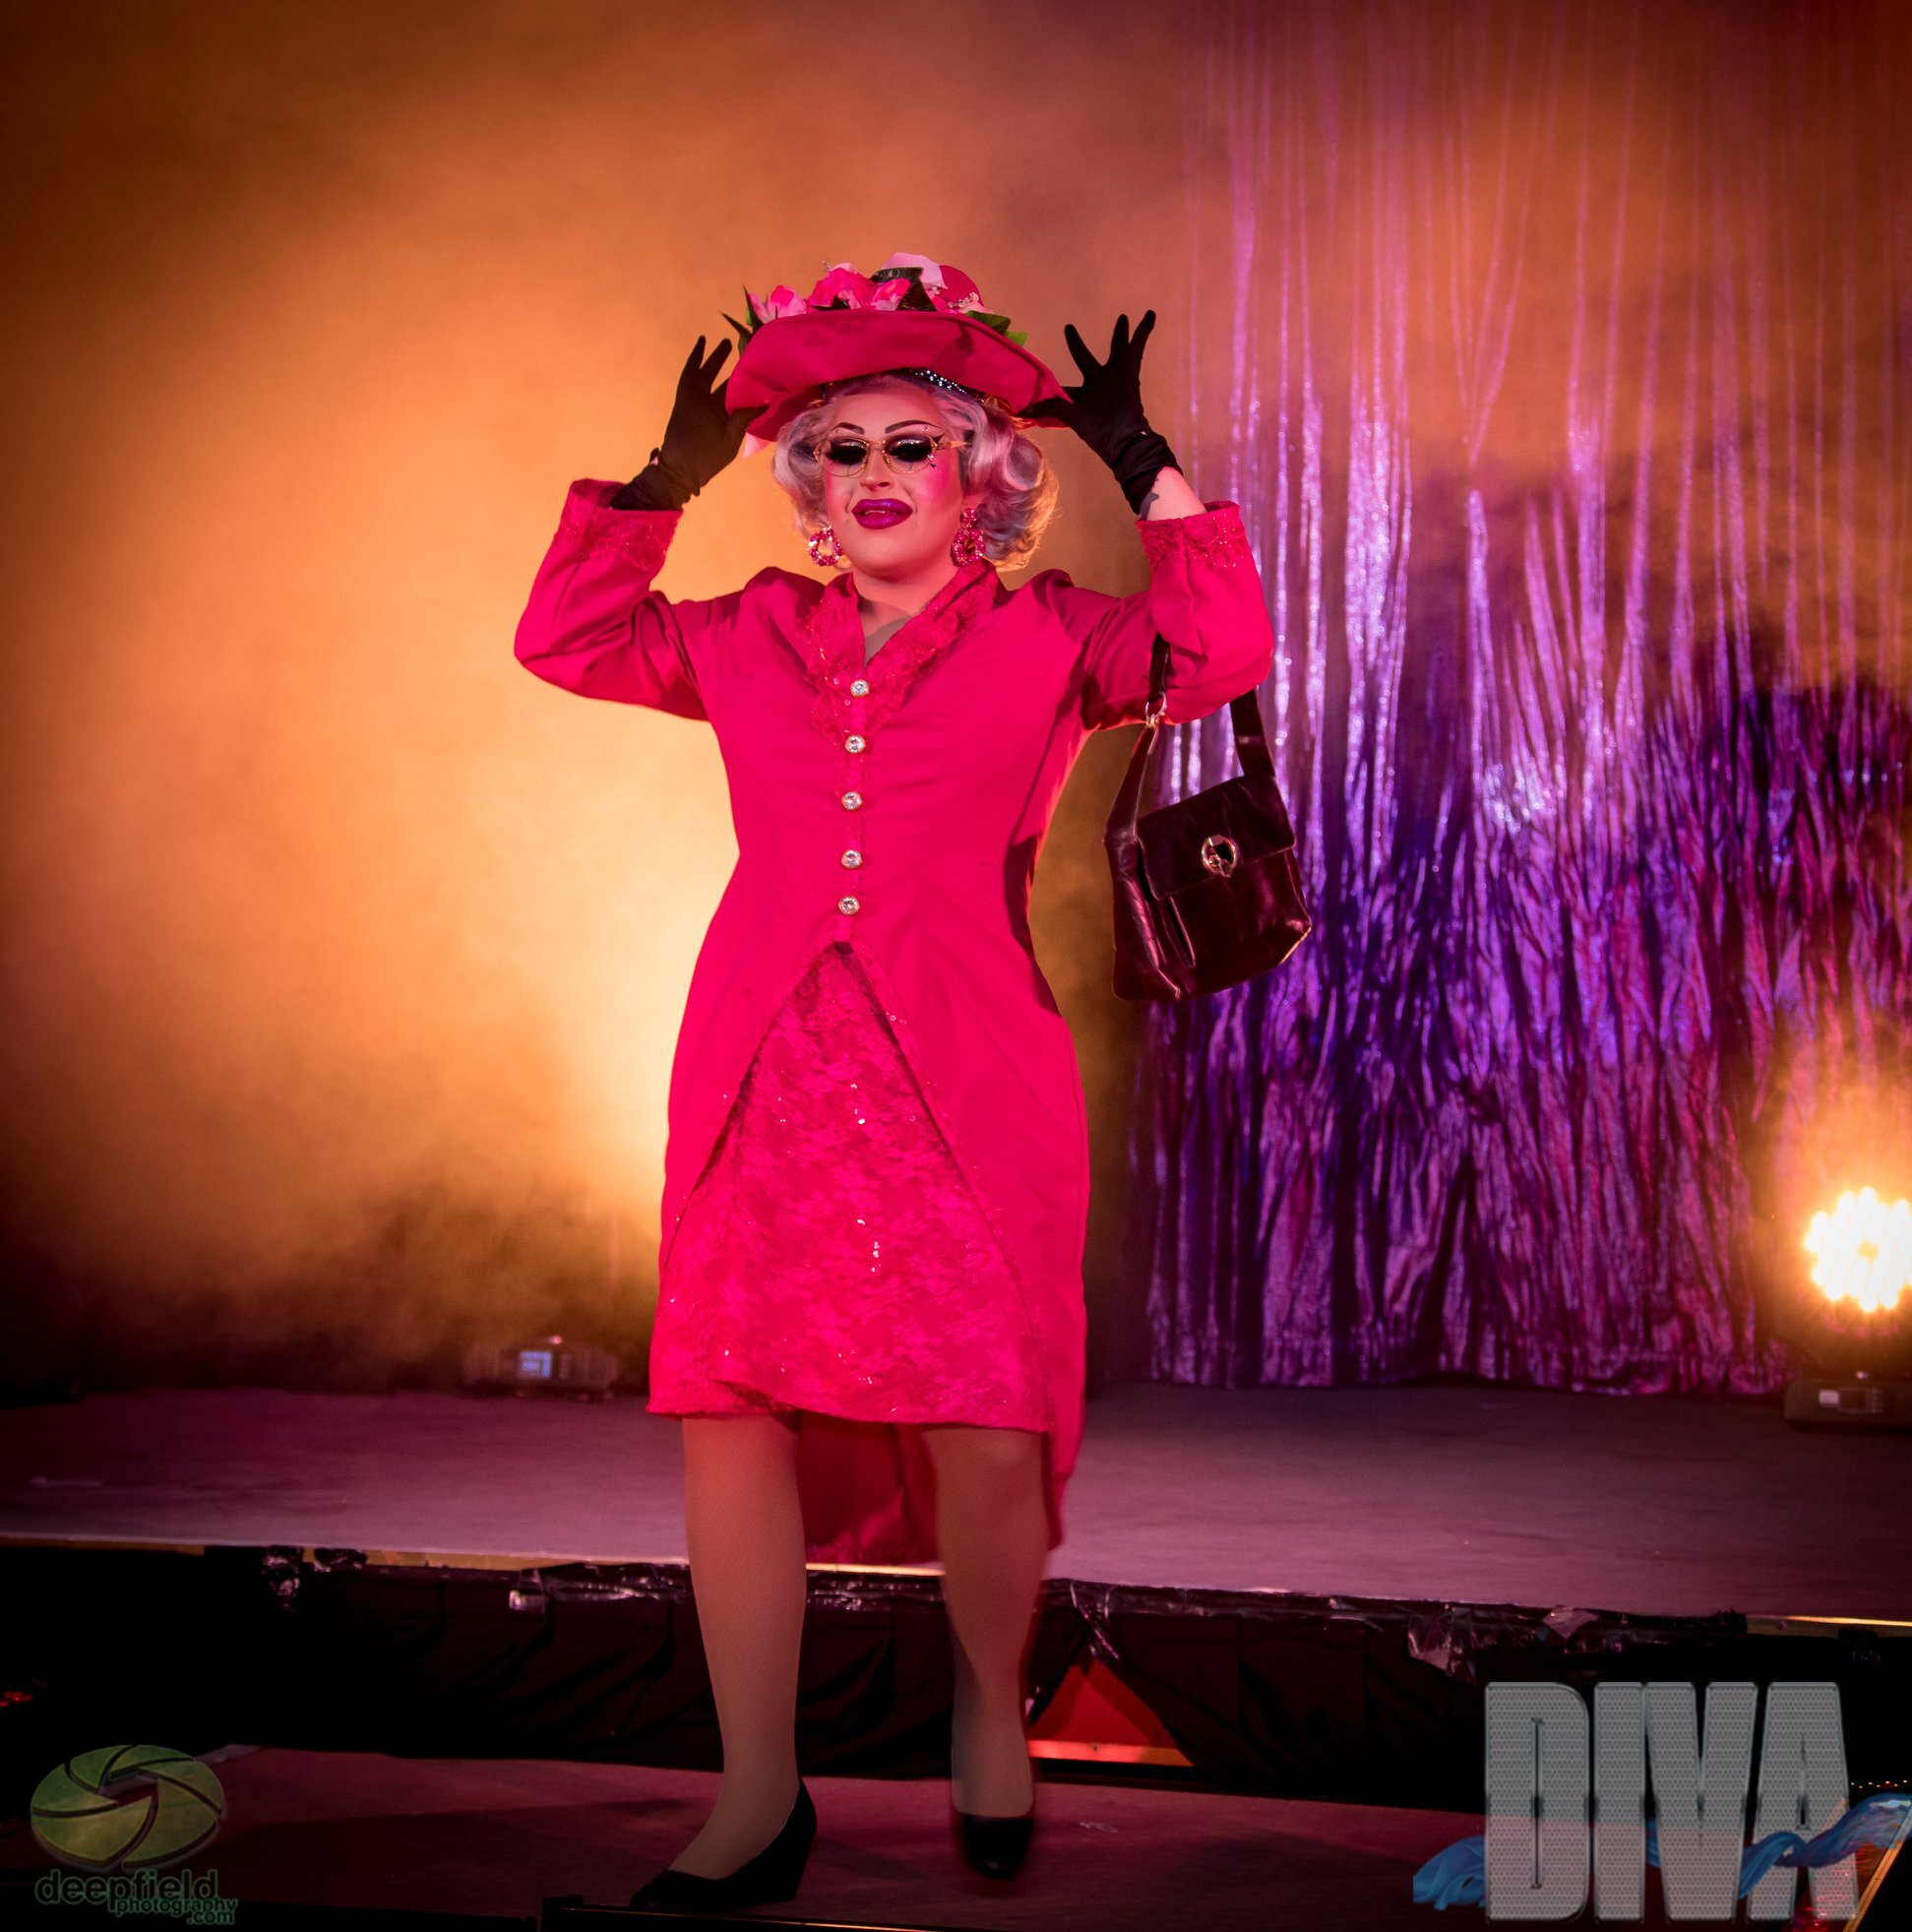 hannah-conda--queen-elizabeth-second-uk-diva-awards-sydney-drag-queen-royalty-best-hire-drag-race-australia-5.jpg